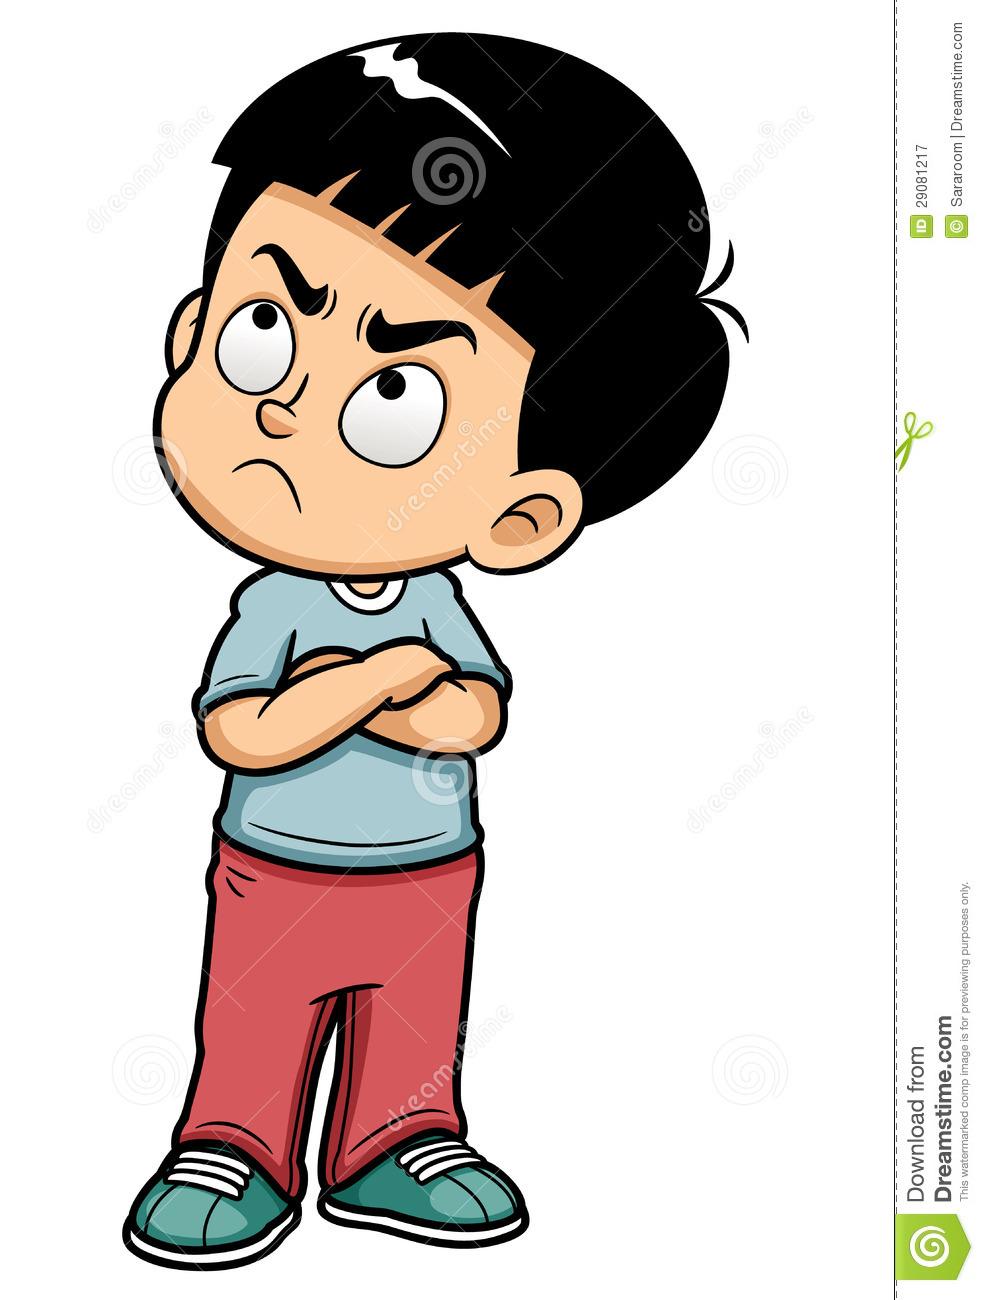 Boy clipart annoyed Boy Clipart Sad Free quarrel%20clipart